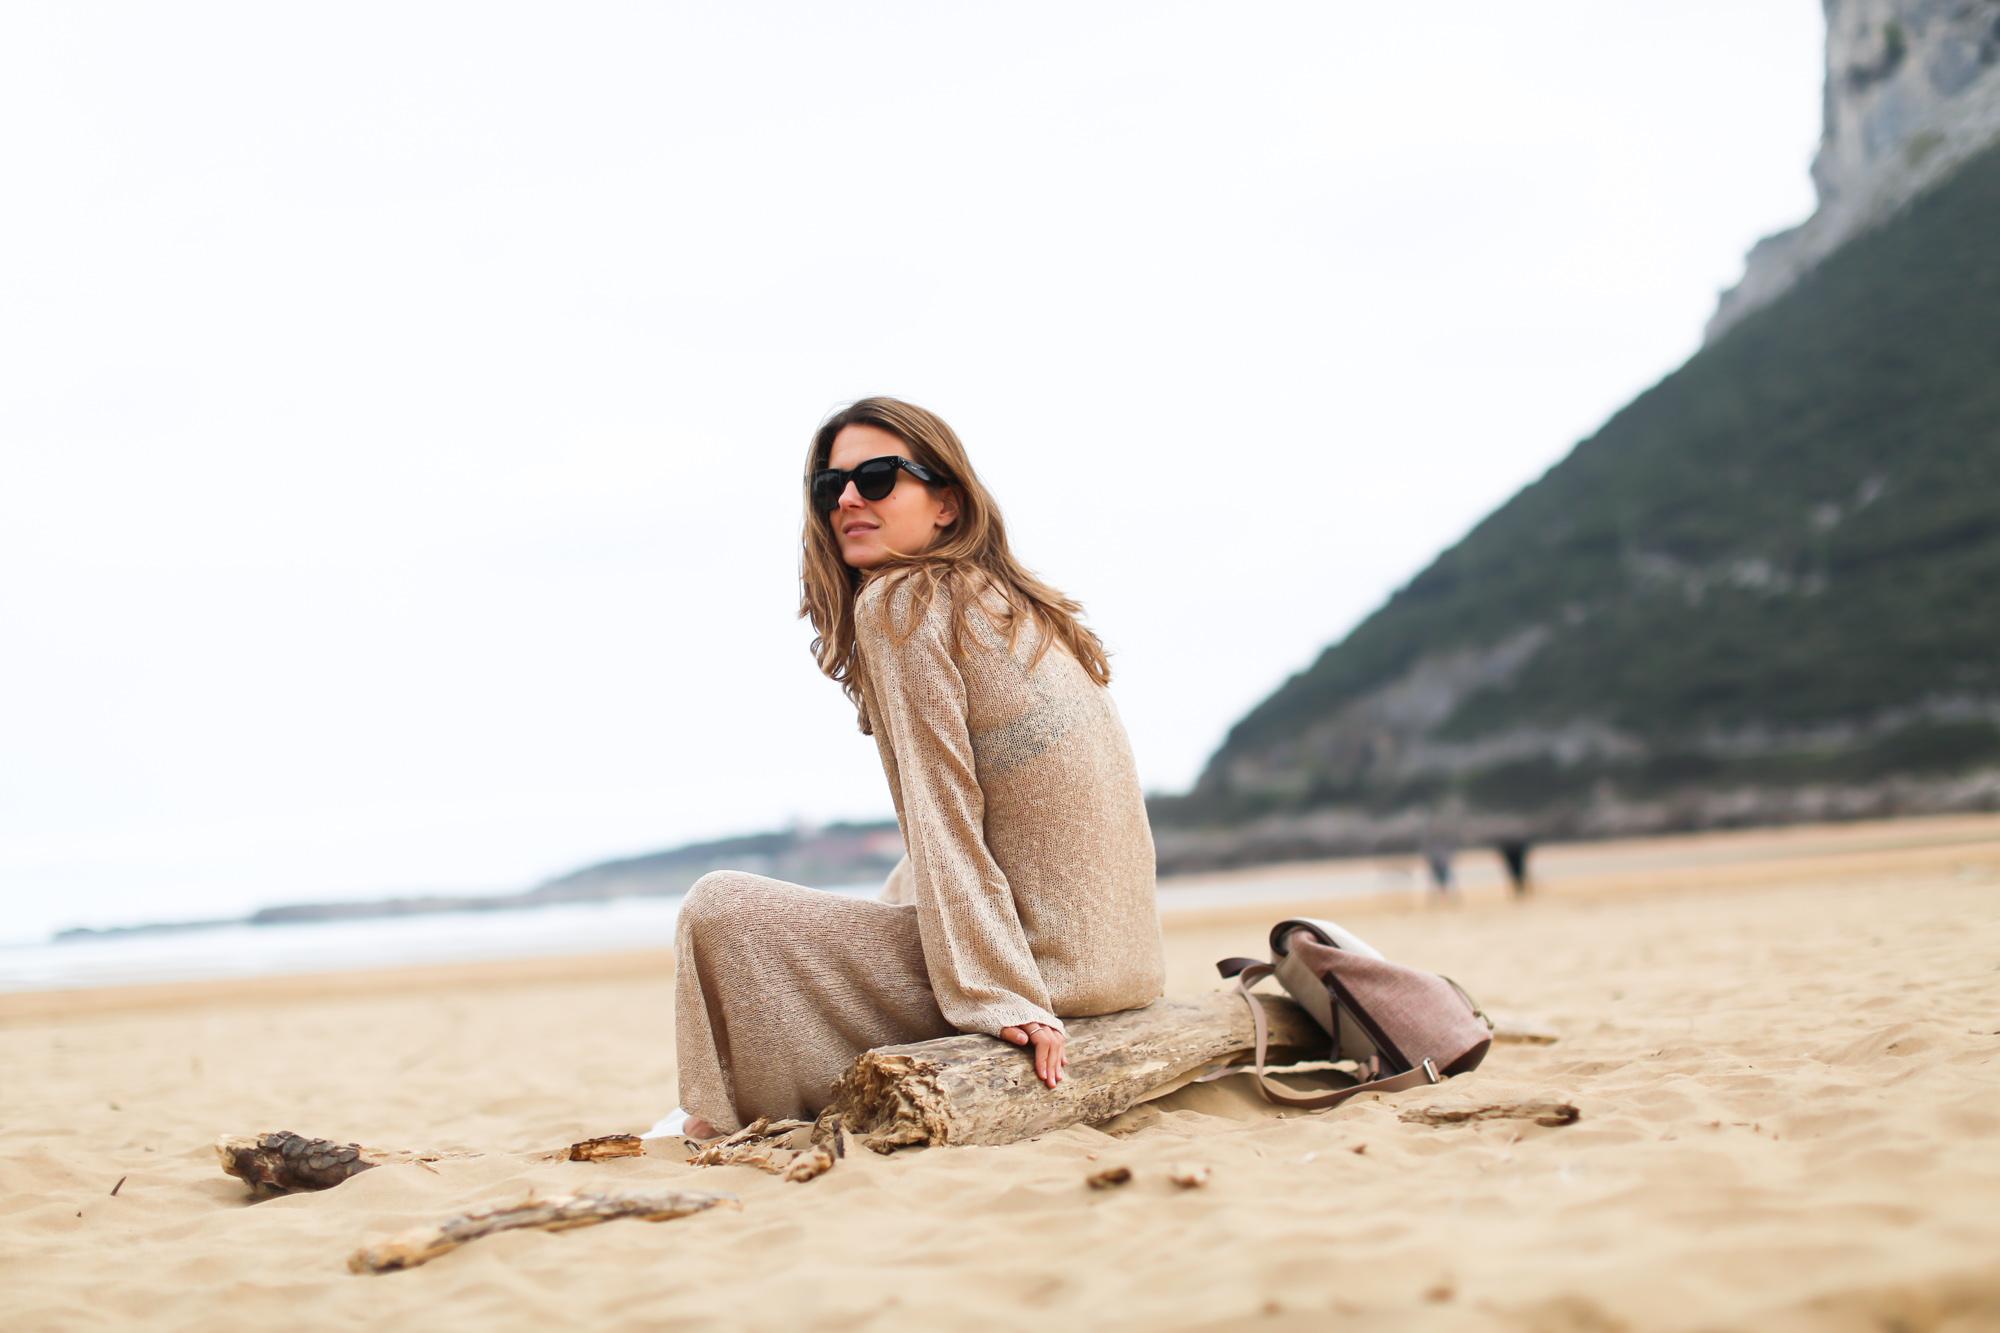 Clochet_pantalon_culotte_Zara_punto_verano